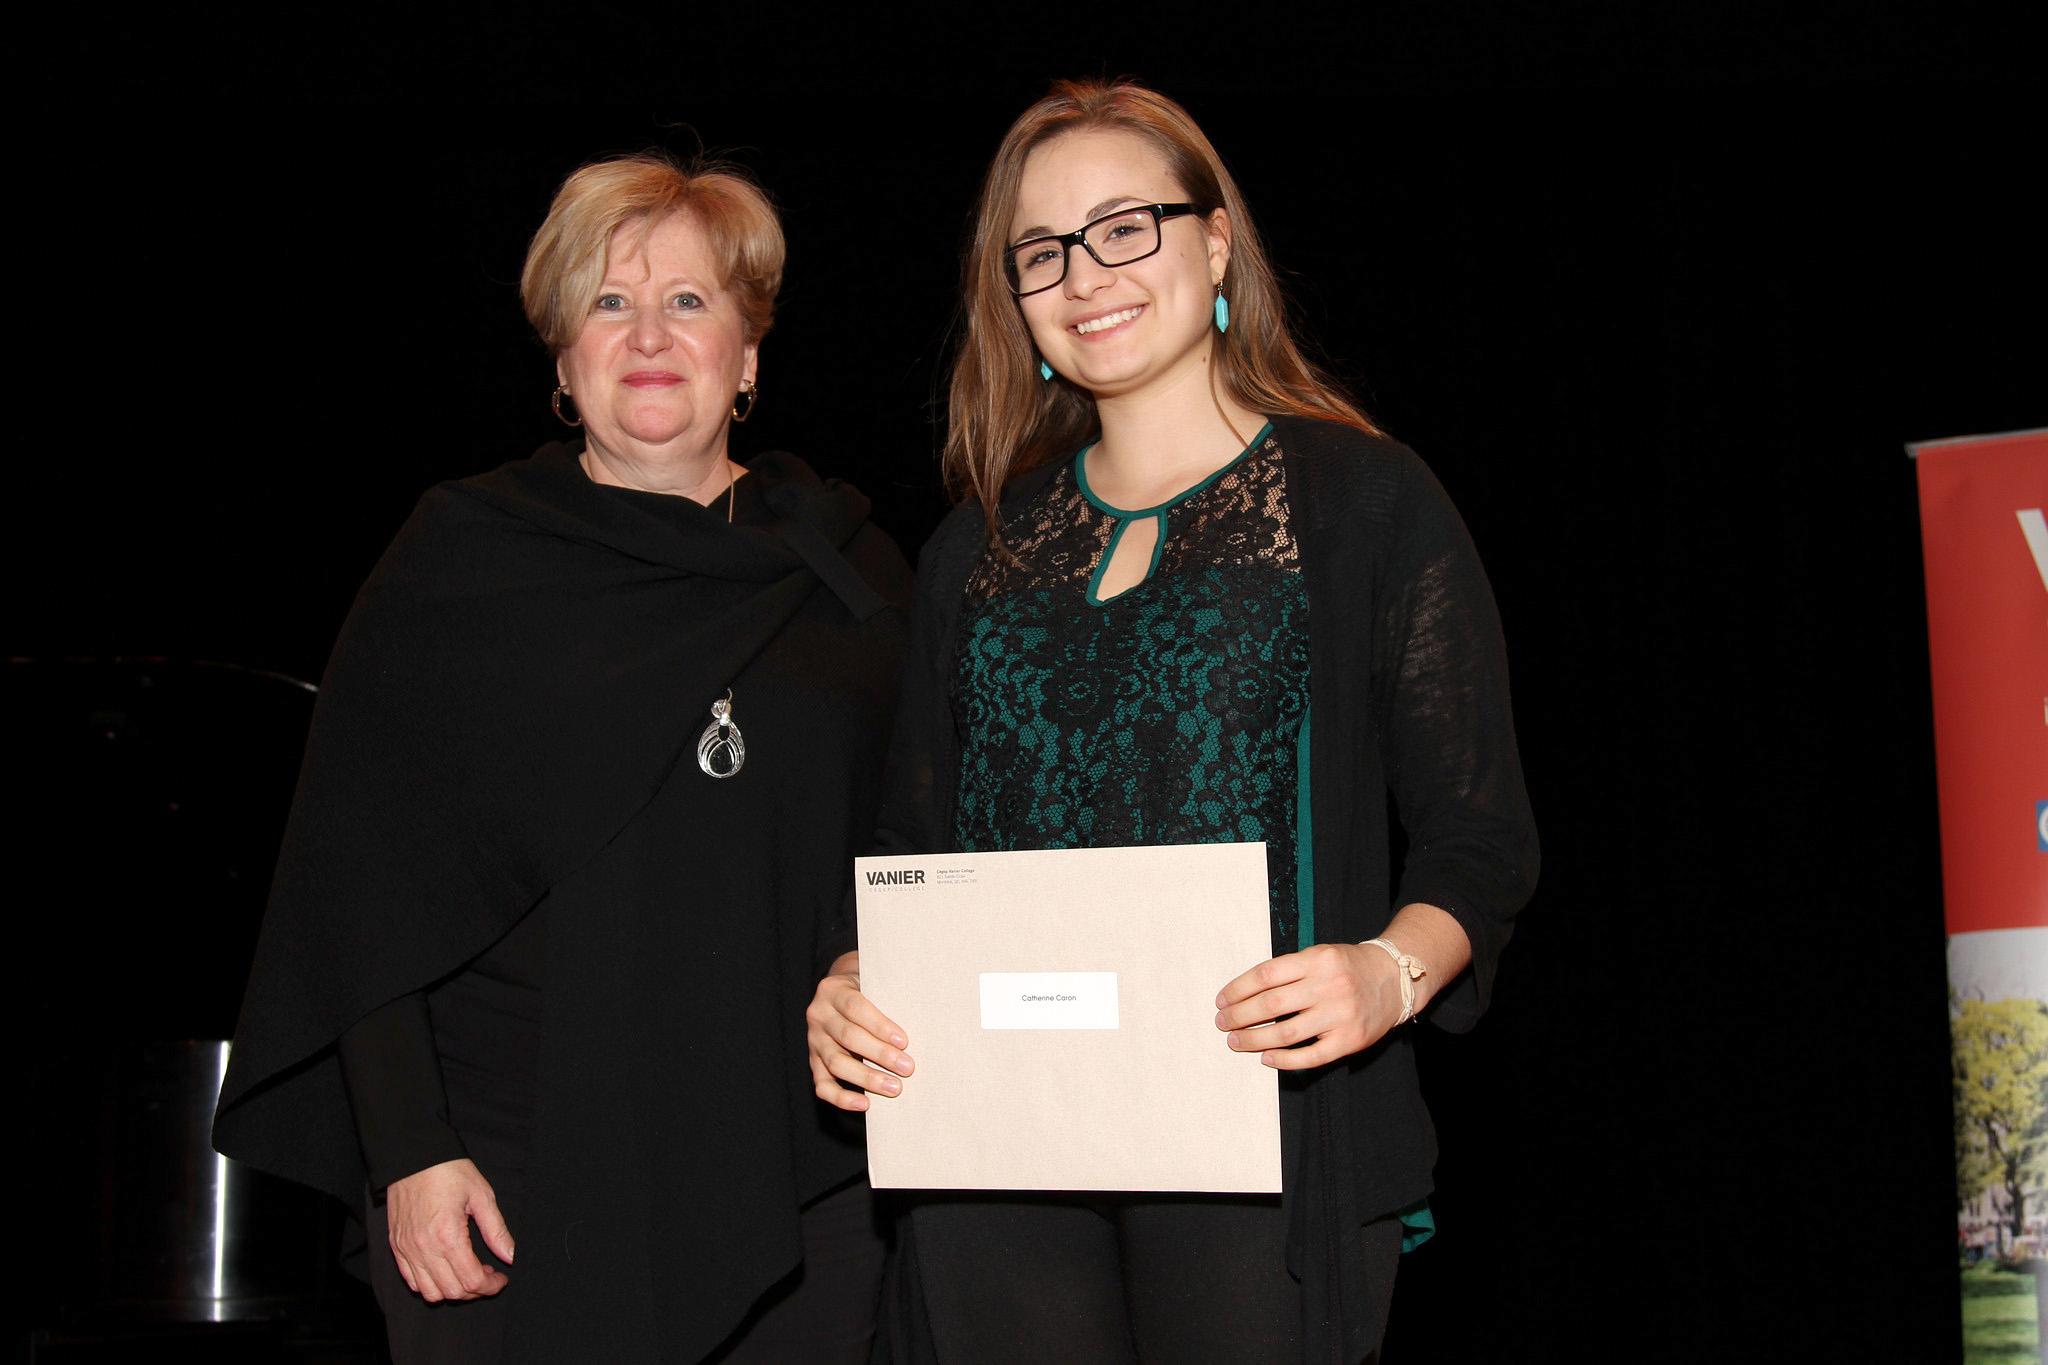 2015-11-26 Vanier Scholarship Ceremony-015-2048e